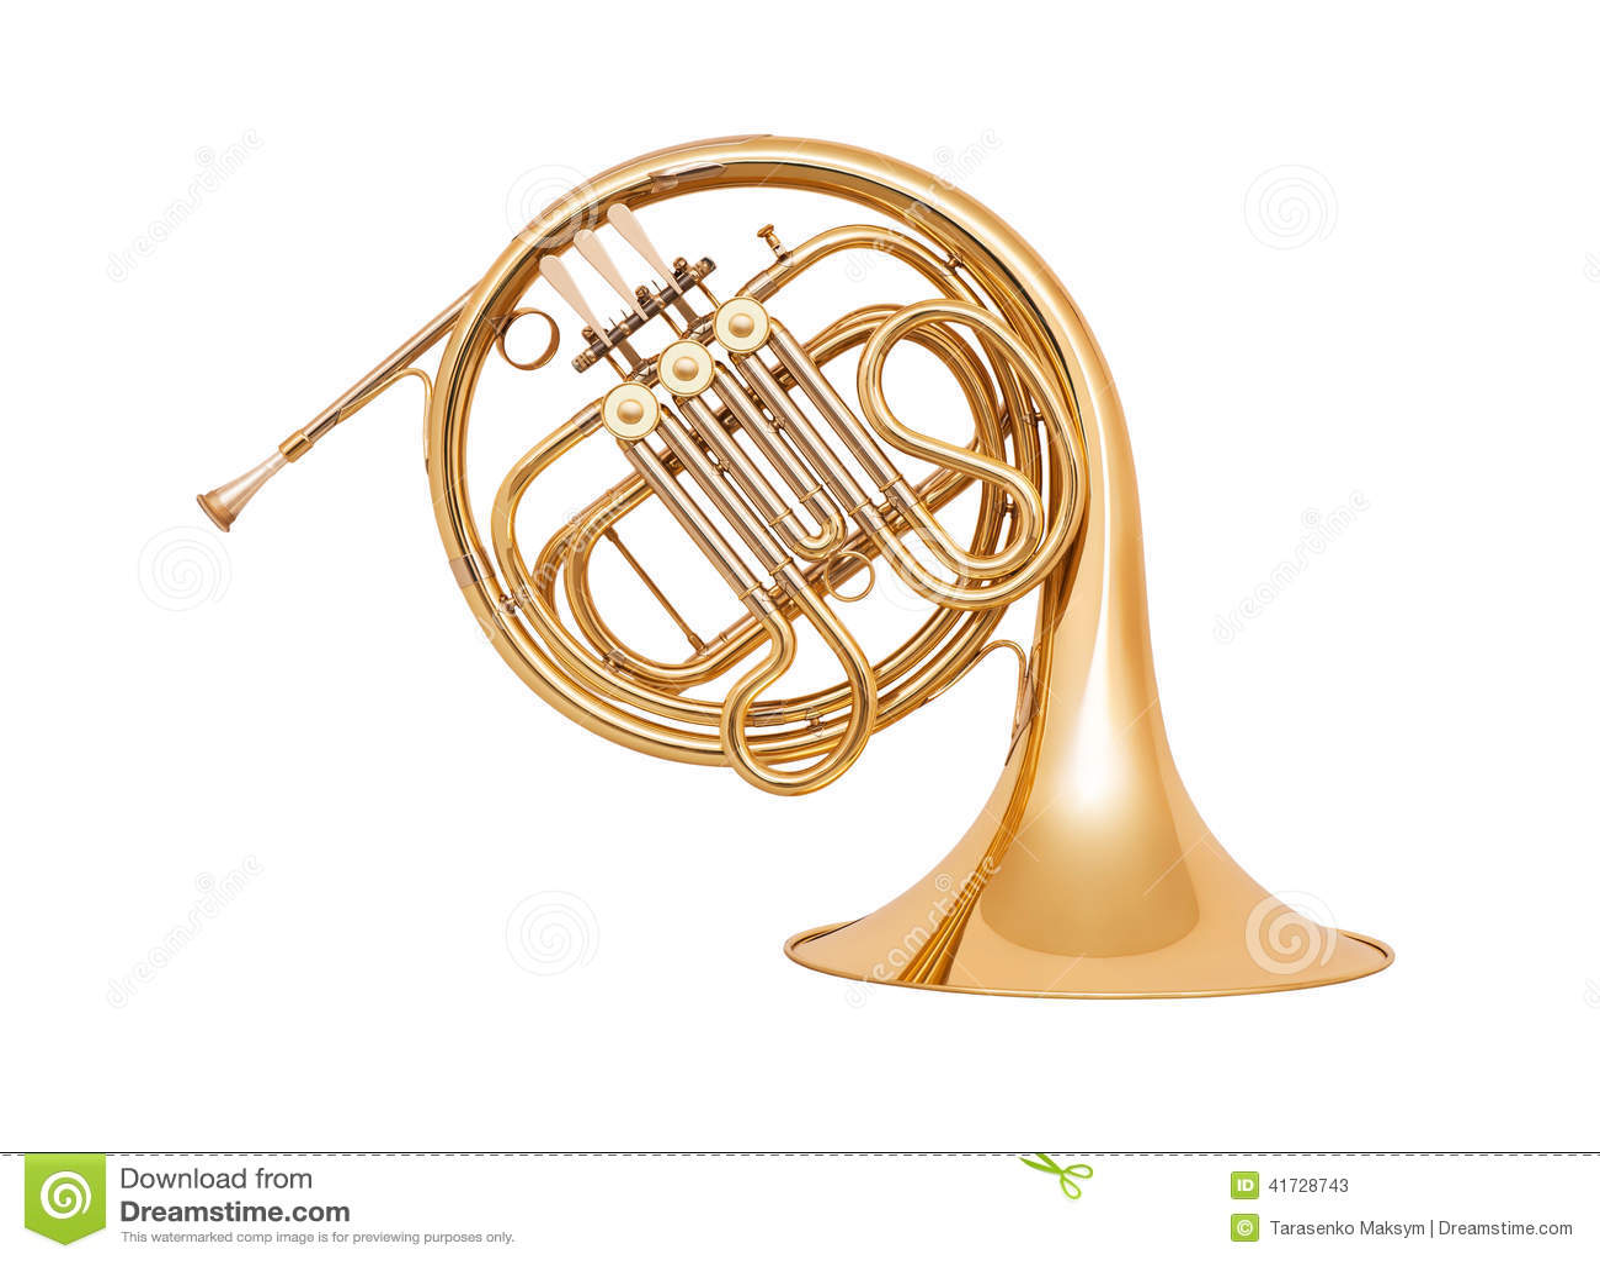 French Horn On White Background Stock Image Image 41728743